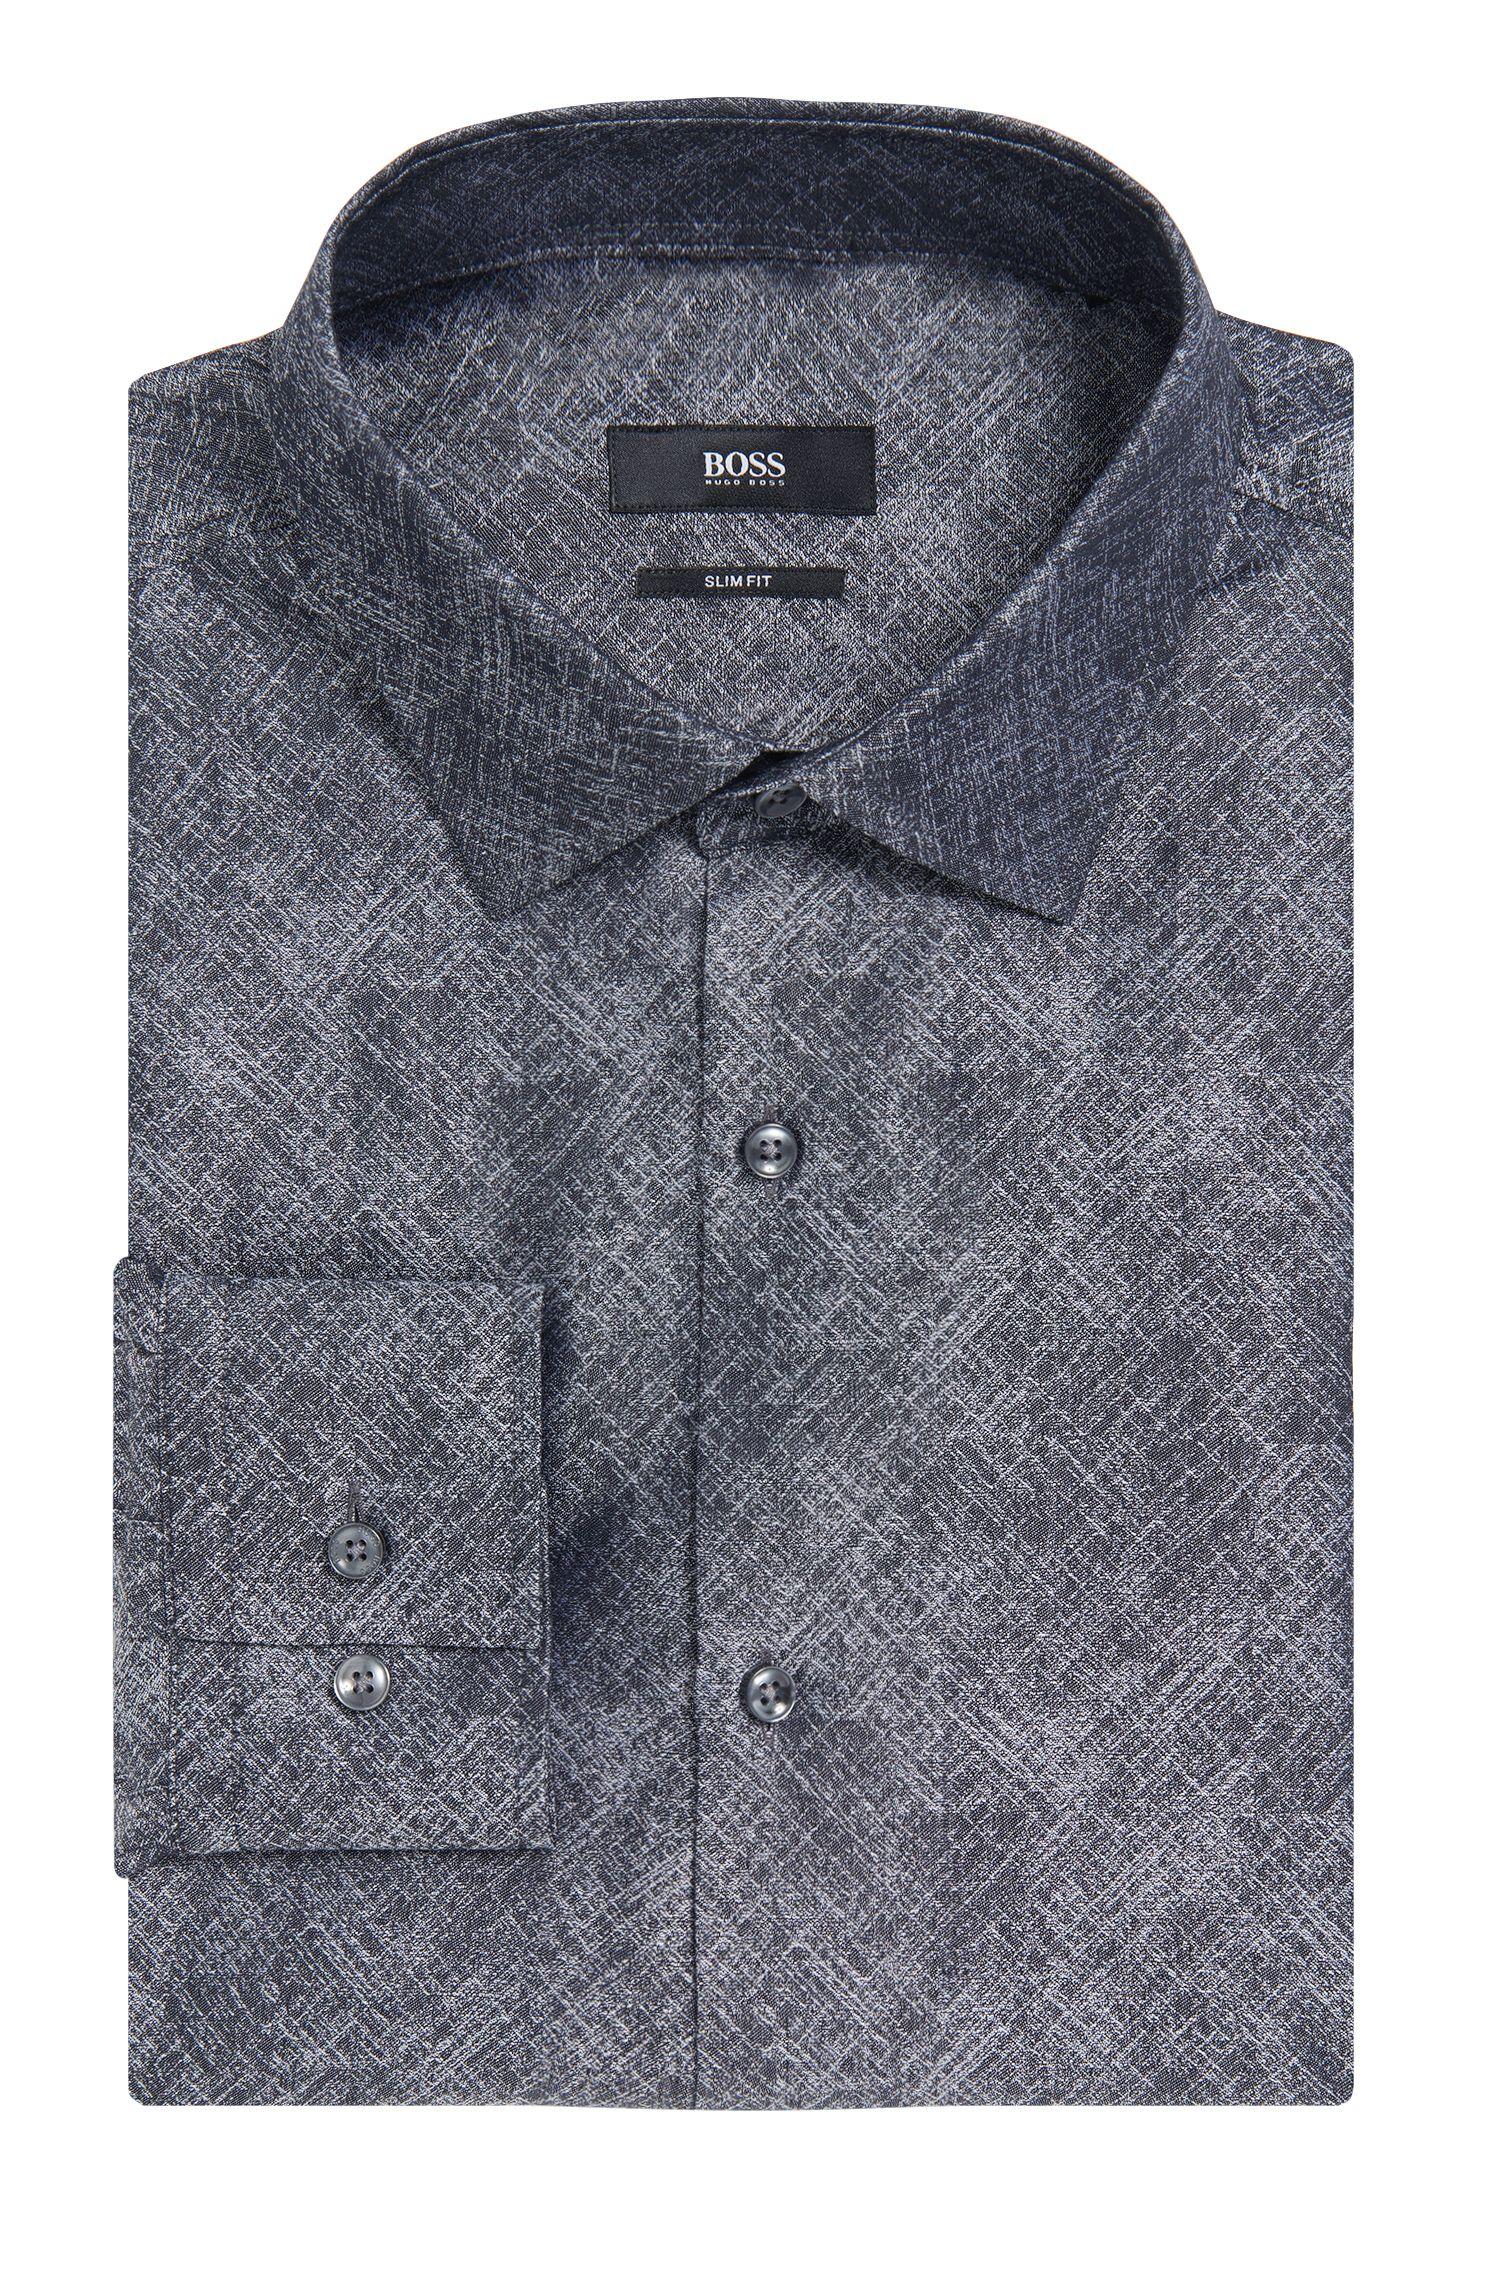 'Jenno' | Slim Fit, Italian Cotton Patterned Dress Shirt